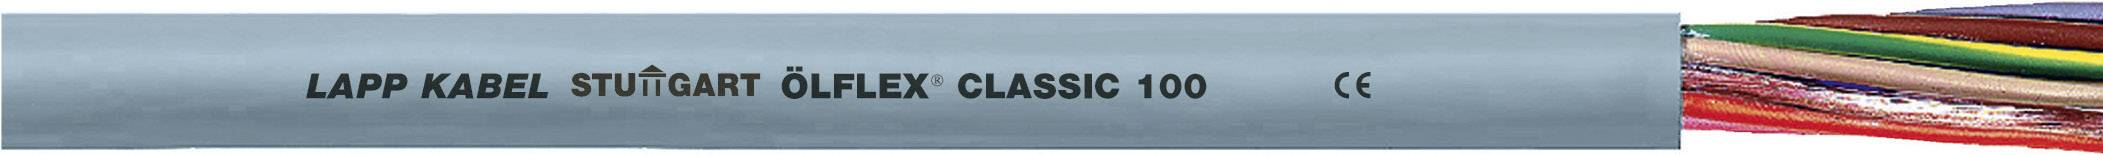 Kabel LappKabel Ölflex CLASSIC 100 4X1 (00102044), PVC, 6,5 mm, 500 V, šedá, 1000 m